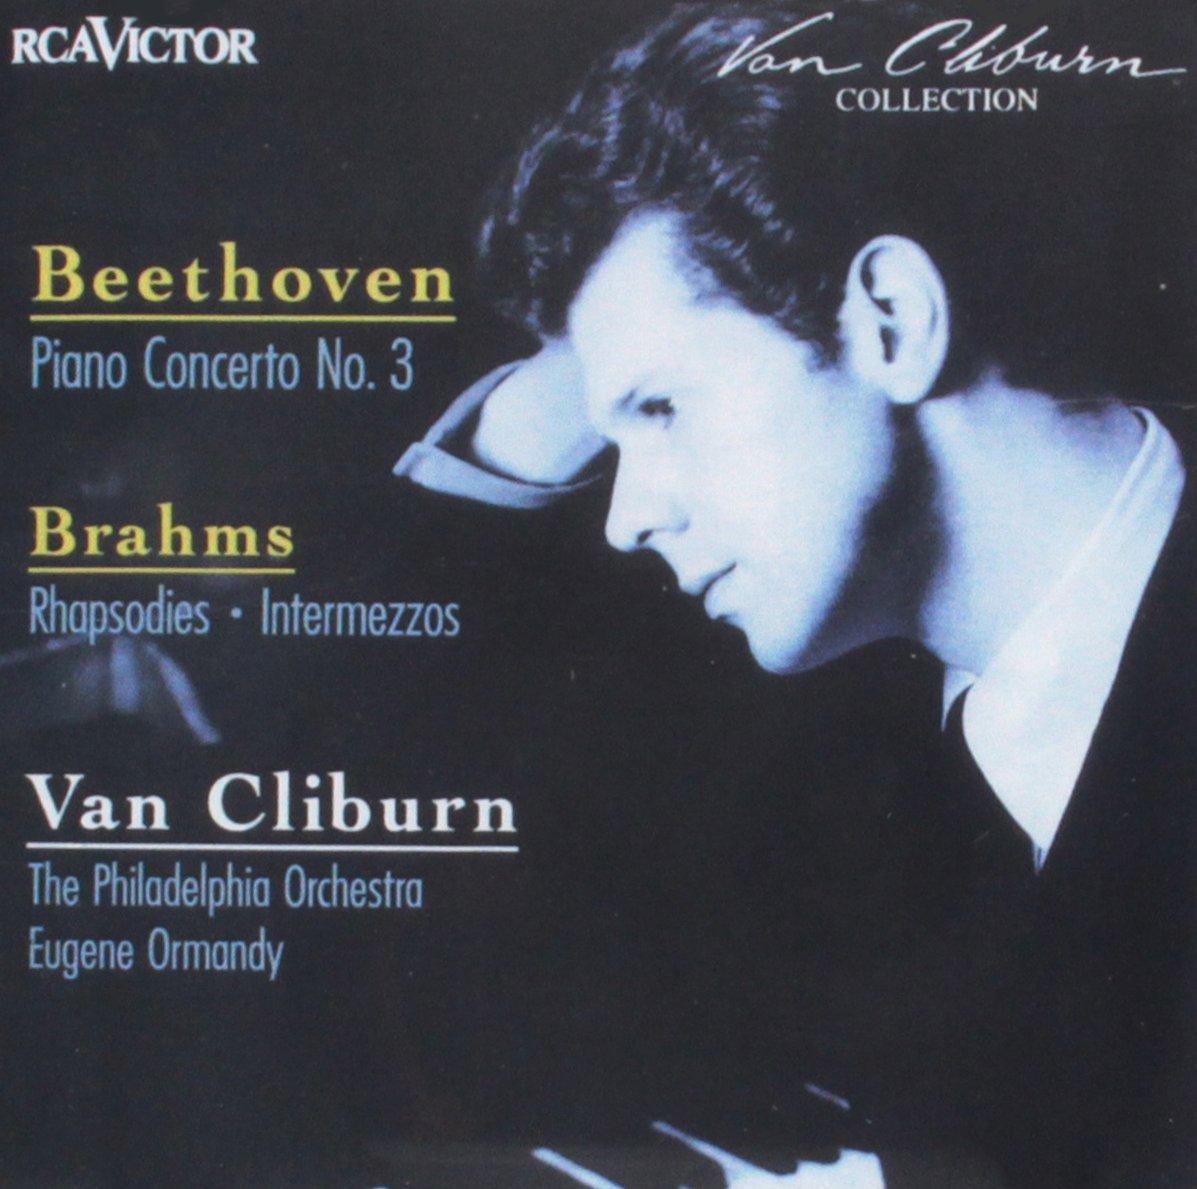 Beethoven: Piano Concerto, No. 3 / Brahms: Rhapsodies & Intermezzos by RCA Legacy